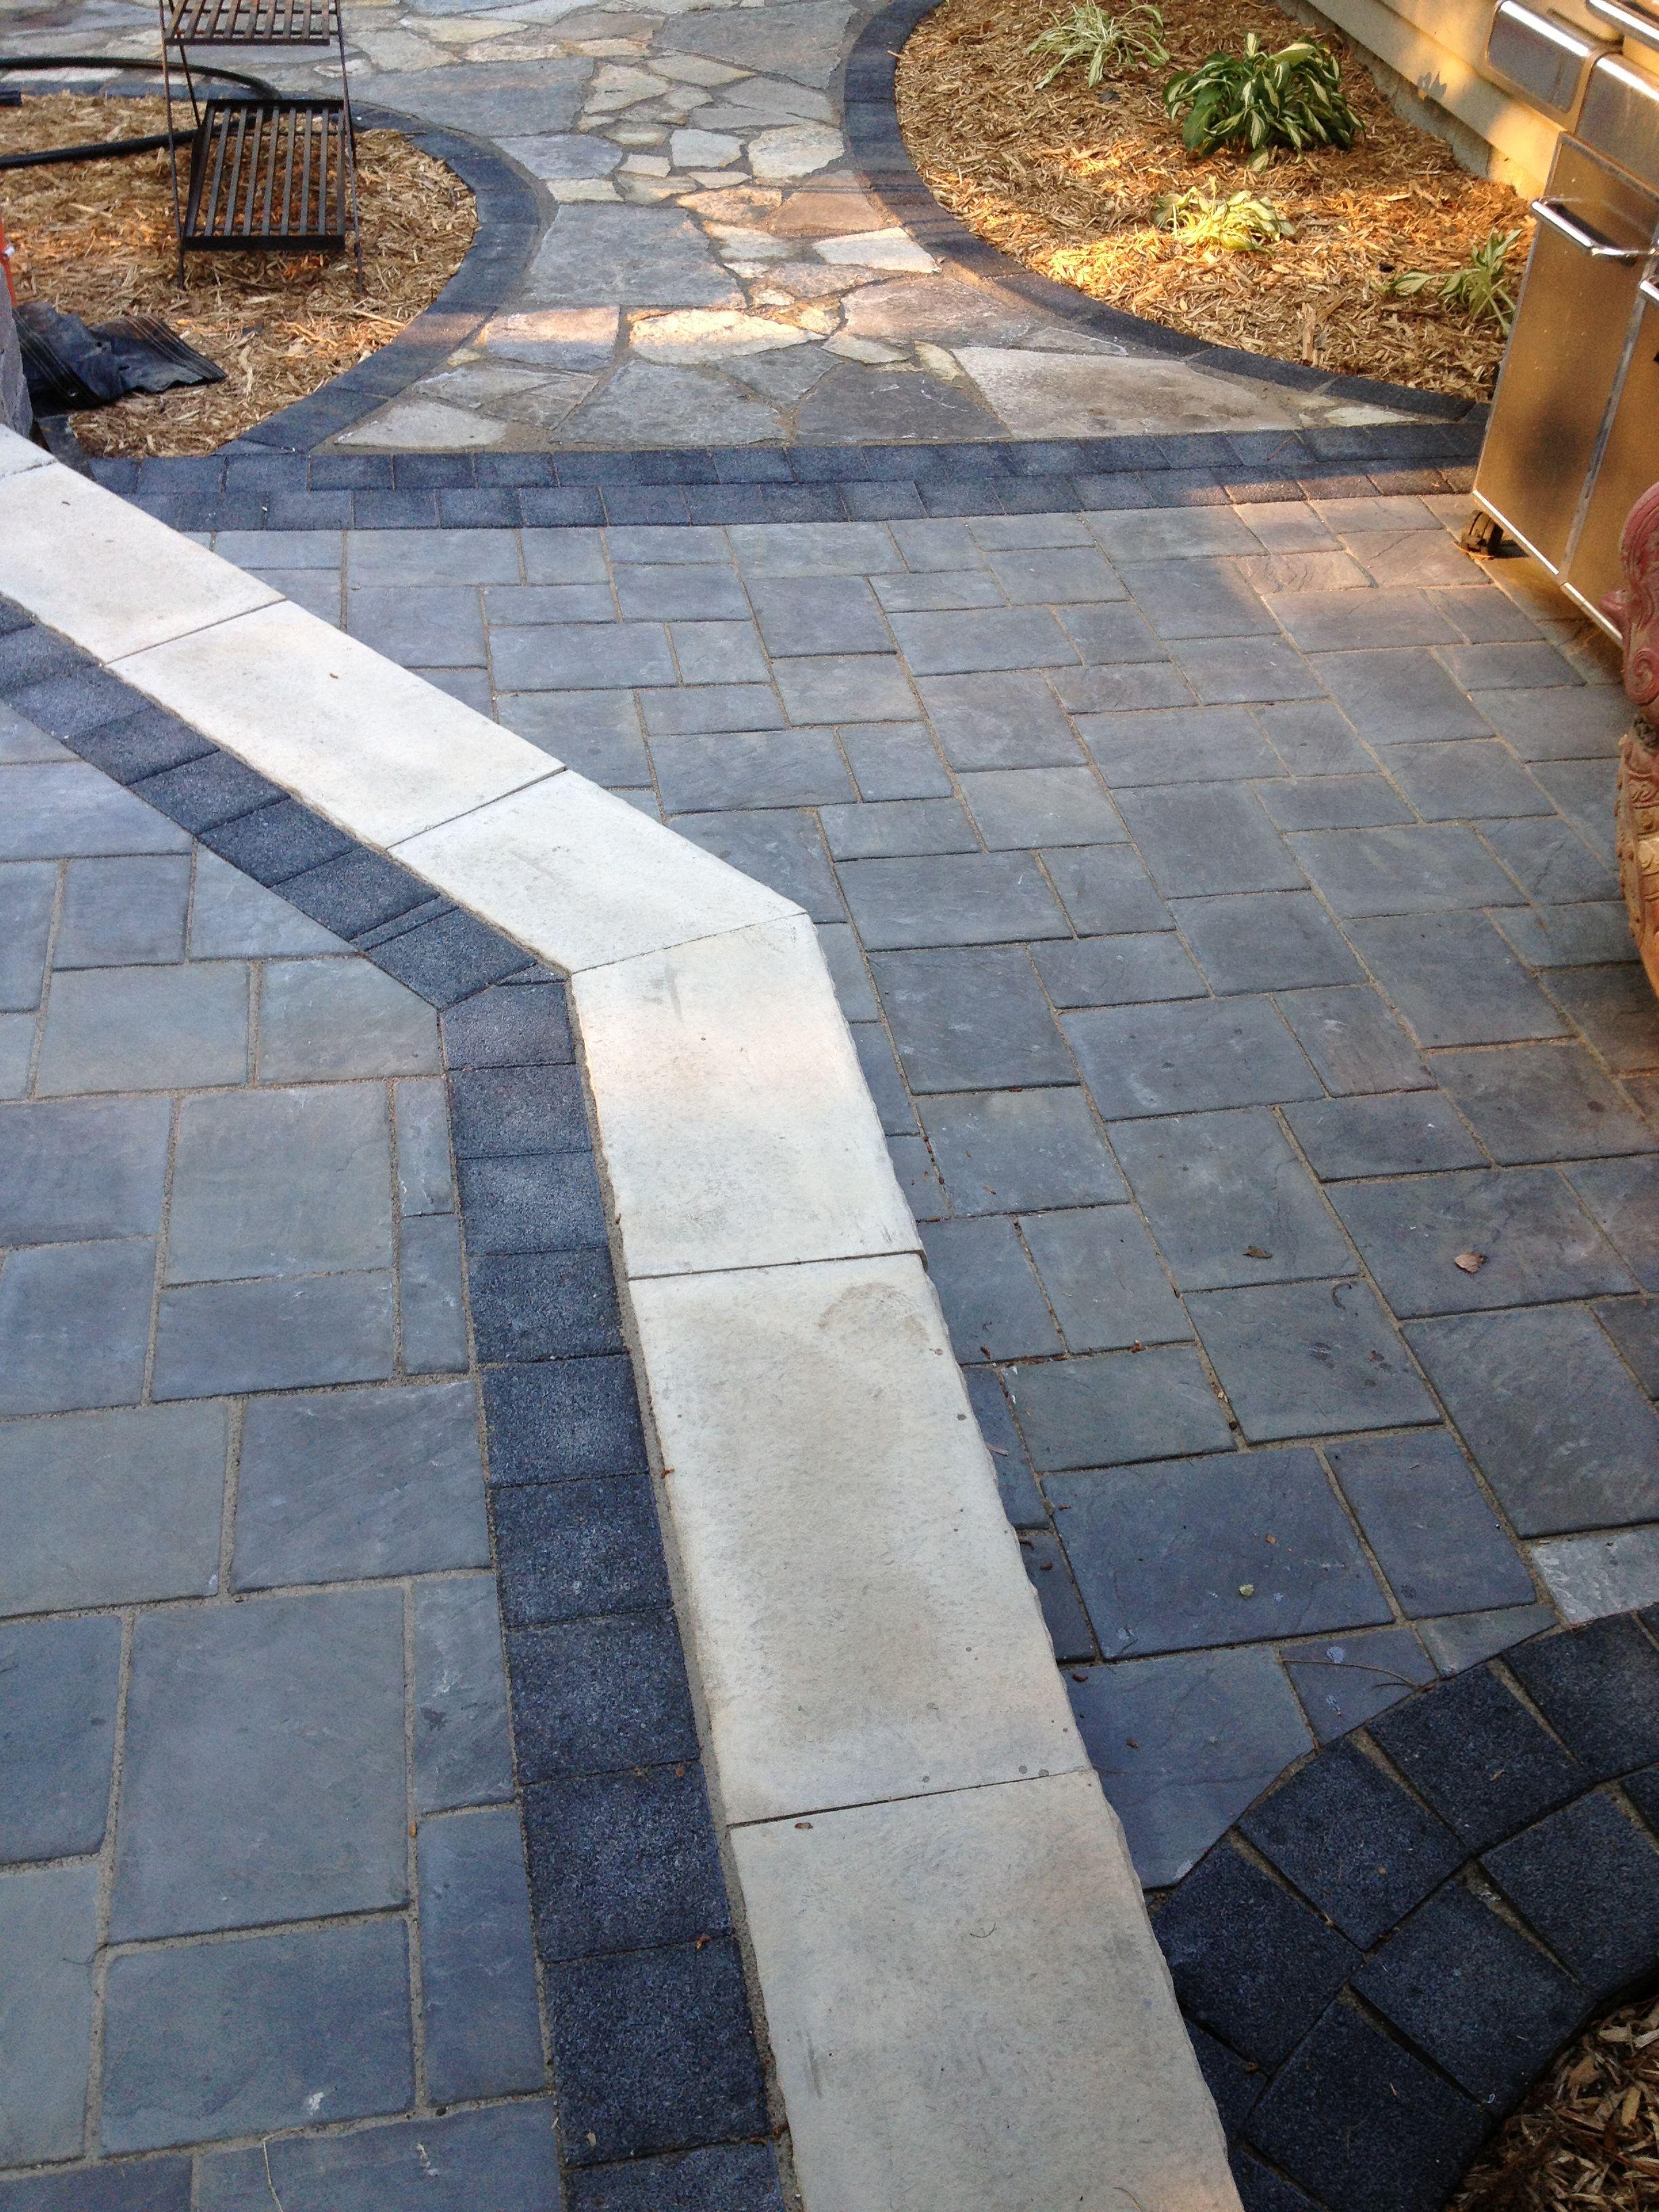 Beautiful Patio Using Unilock Brick Pavers Stonehenge Coping Series 3000 Black Accent Brick And Richcliff Patio Patterns Ideas Paver Patio Brick Paver Patio